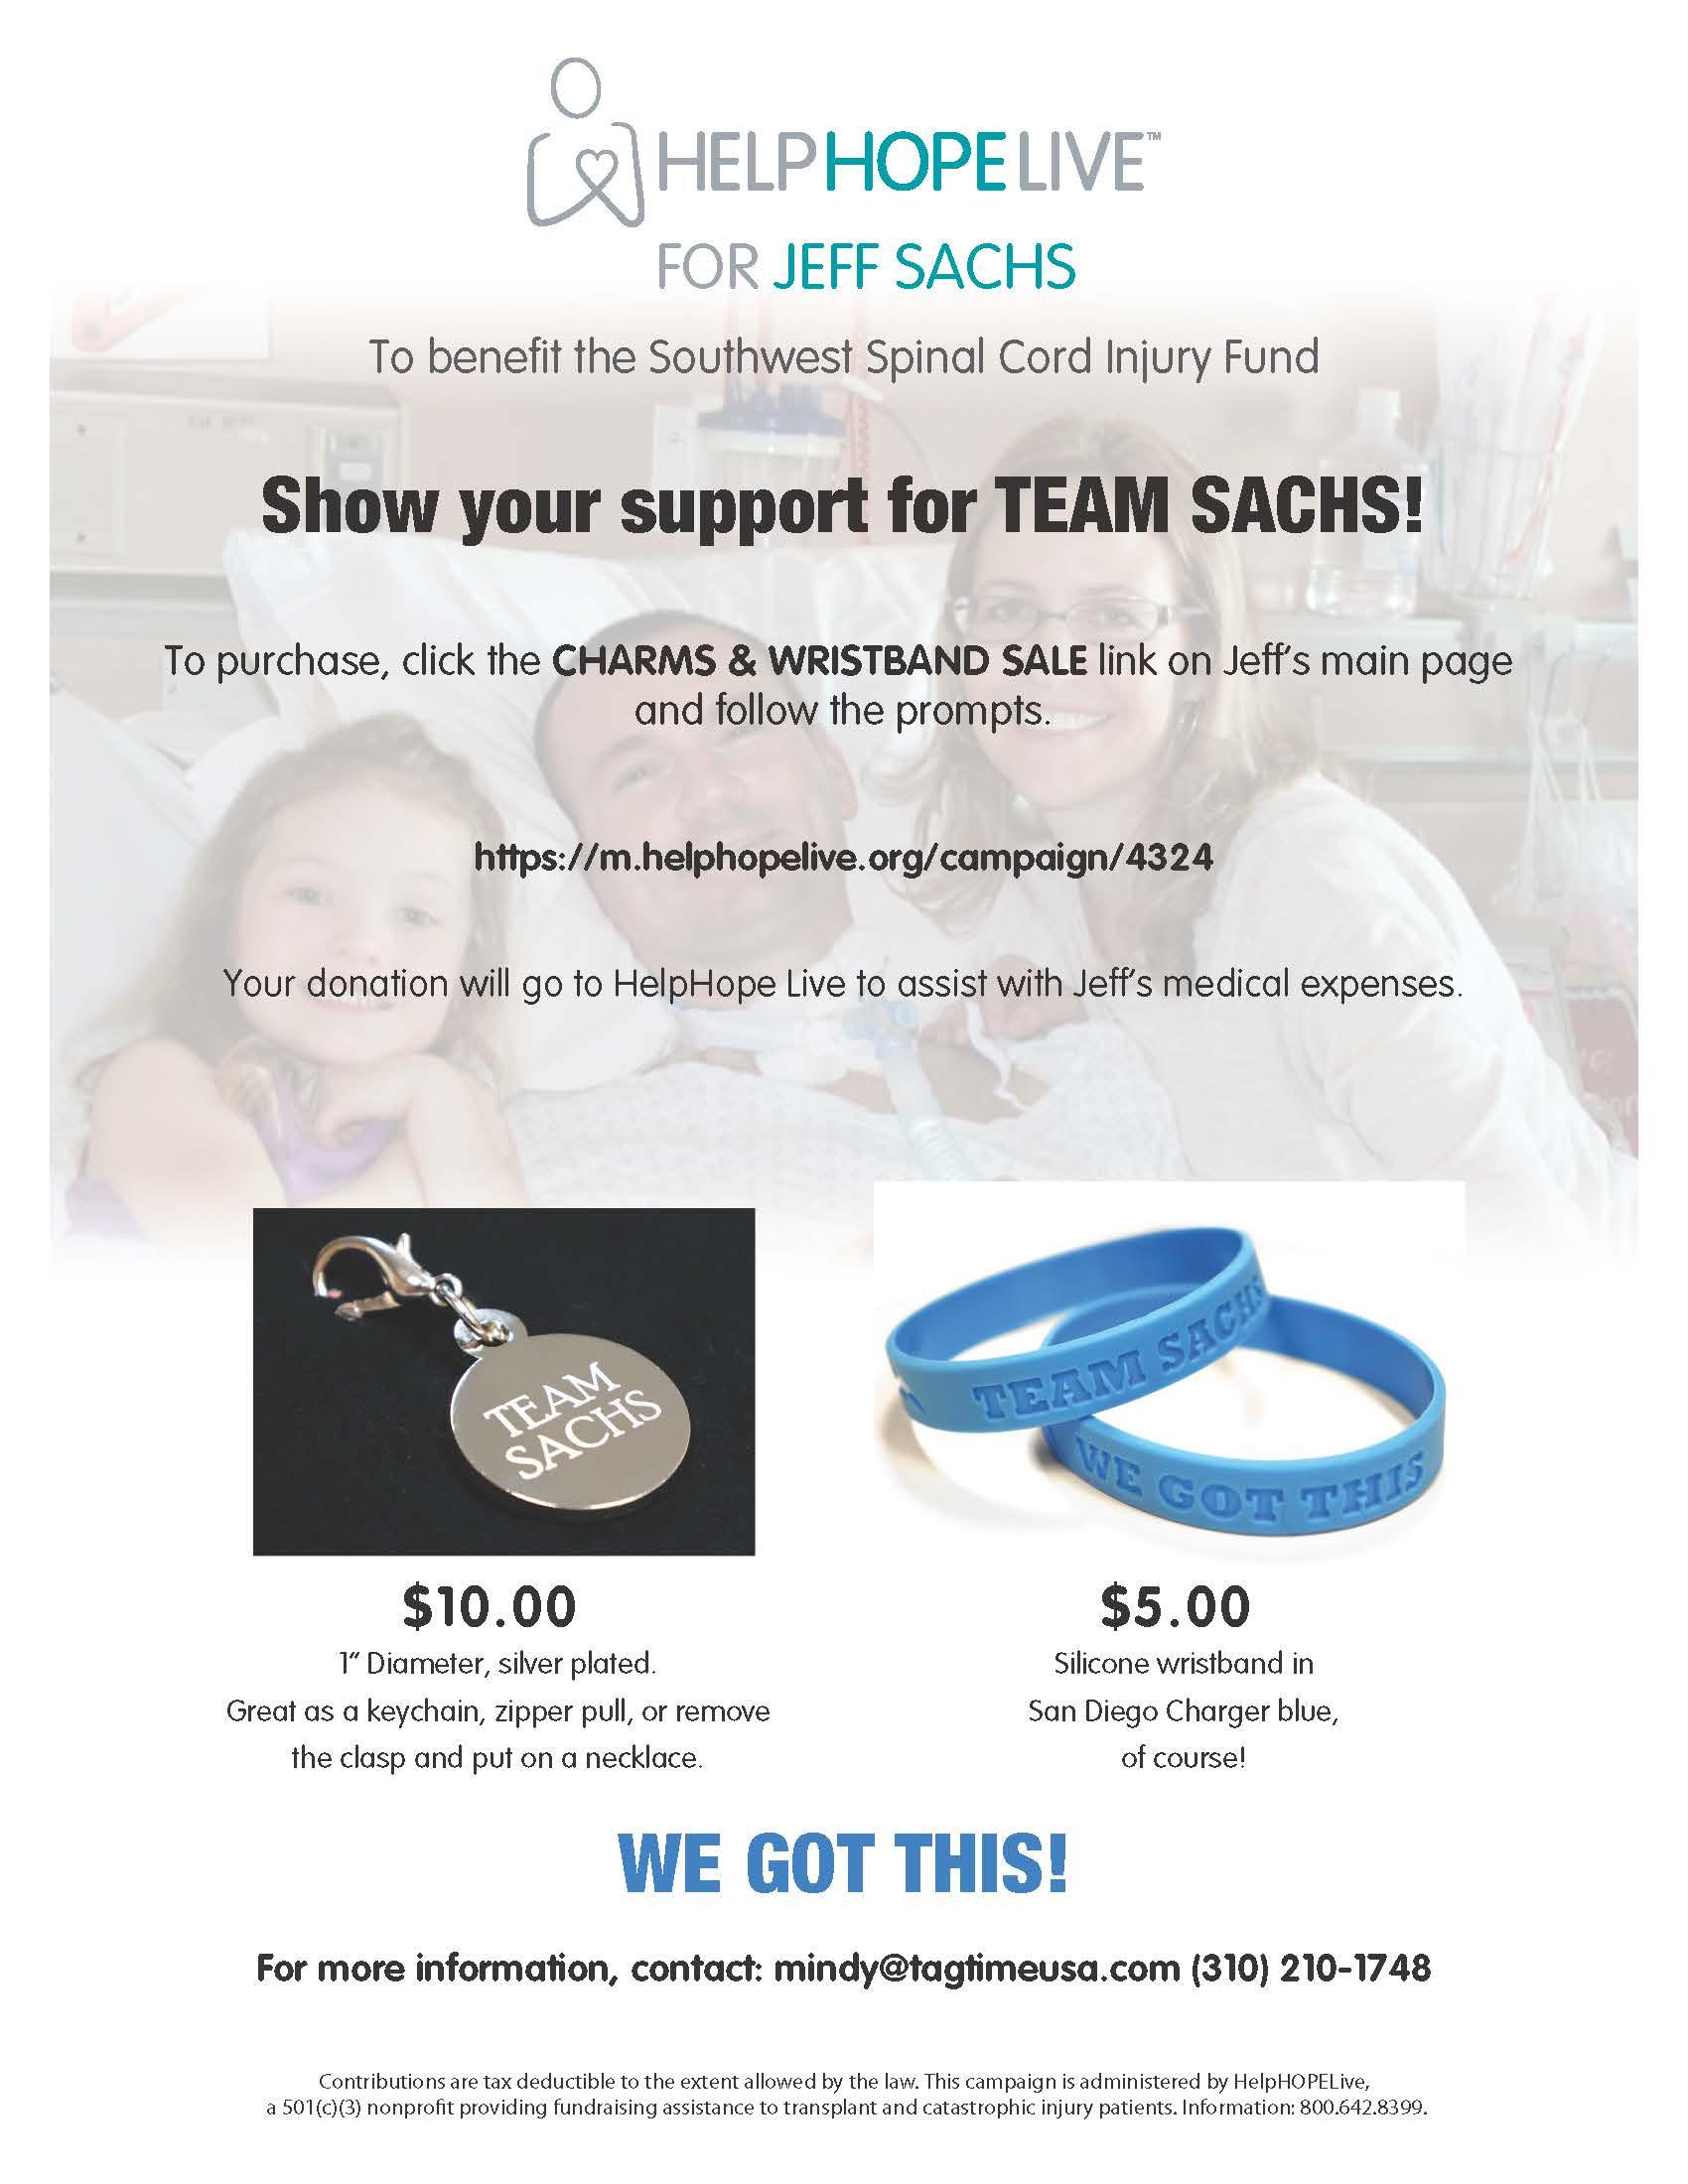 Charms & Wristband Sale